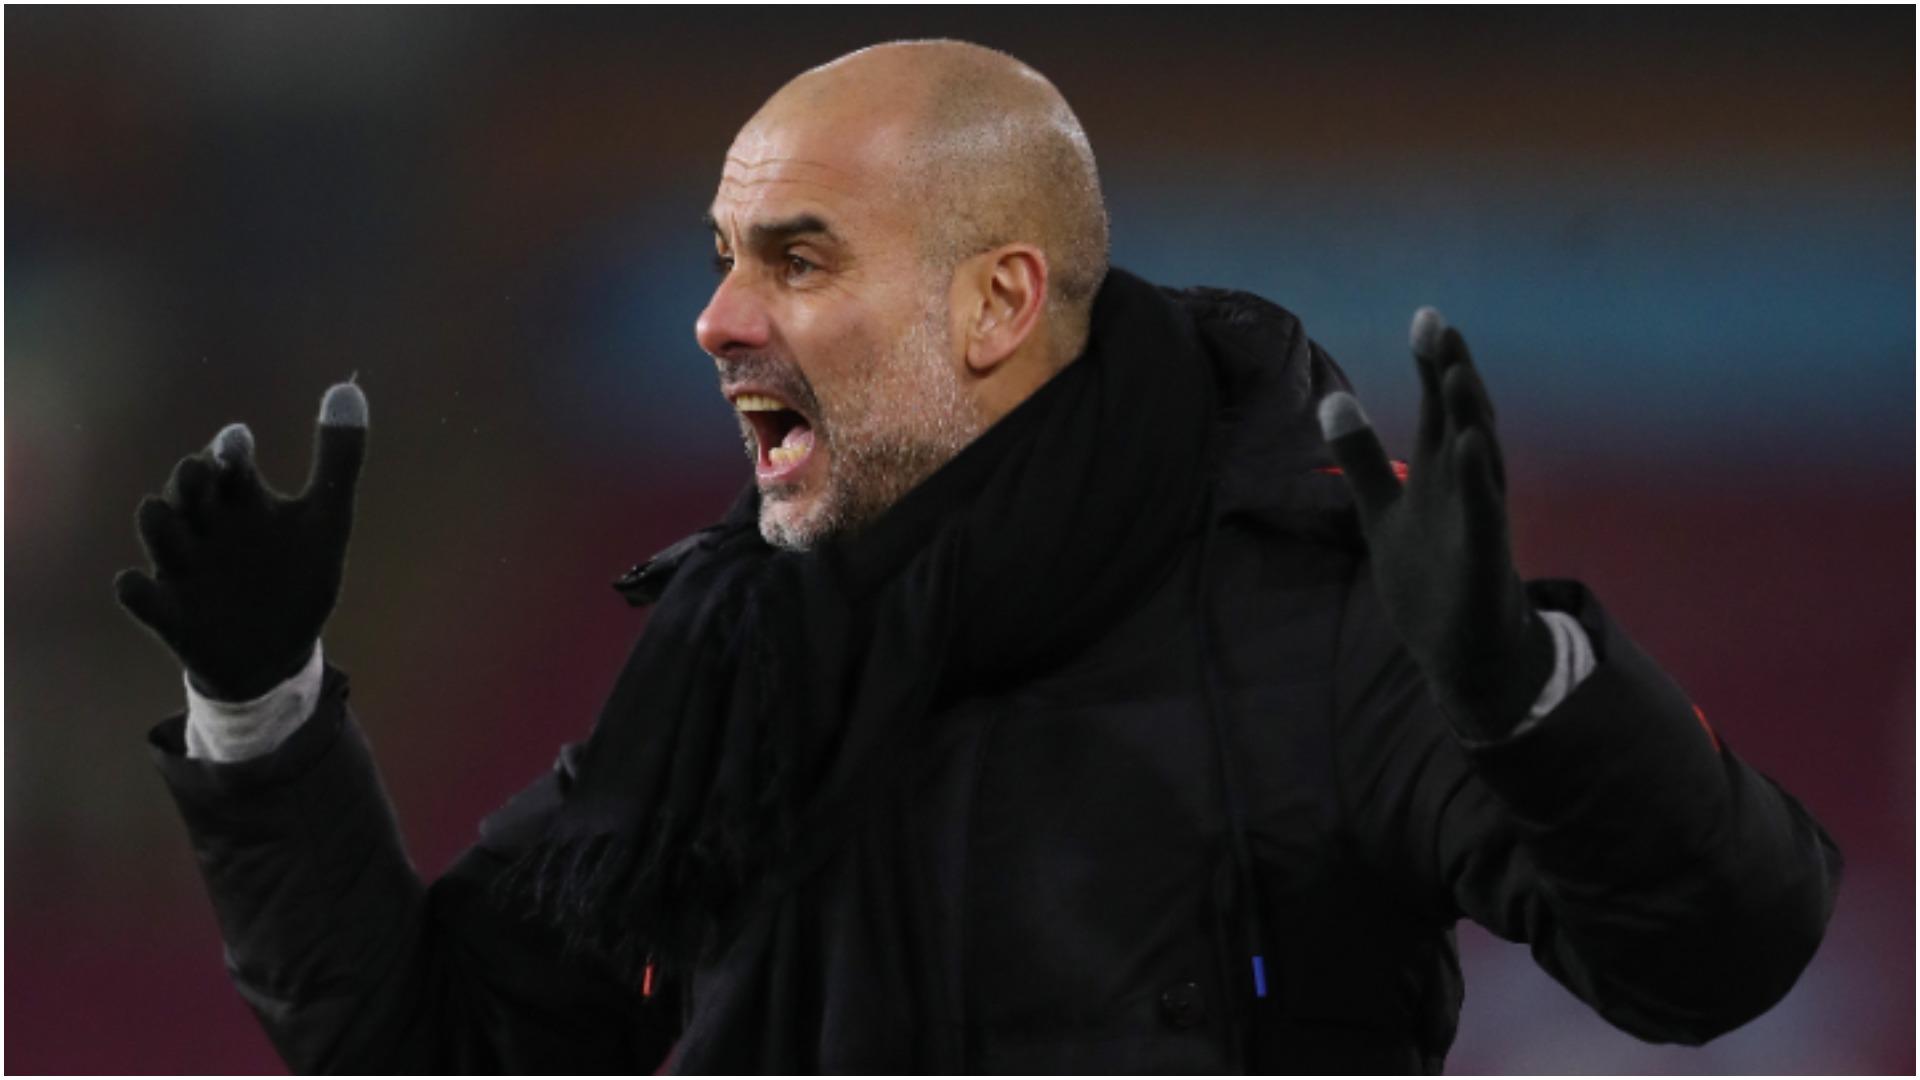 Guardiola stays focused as in-form Man City extend winning streak